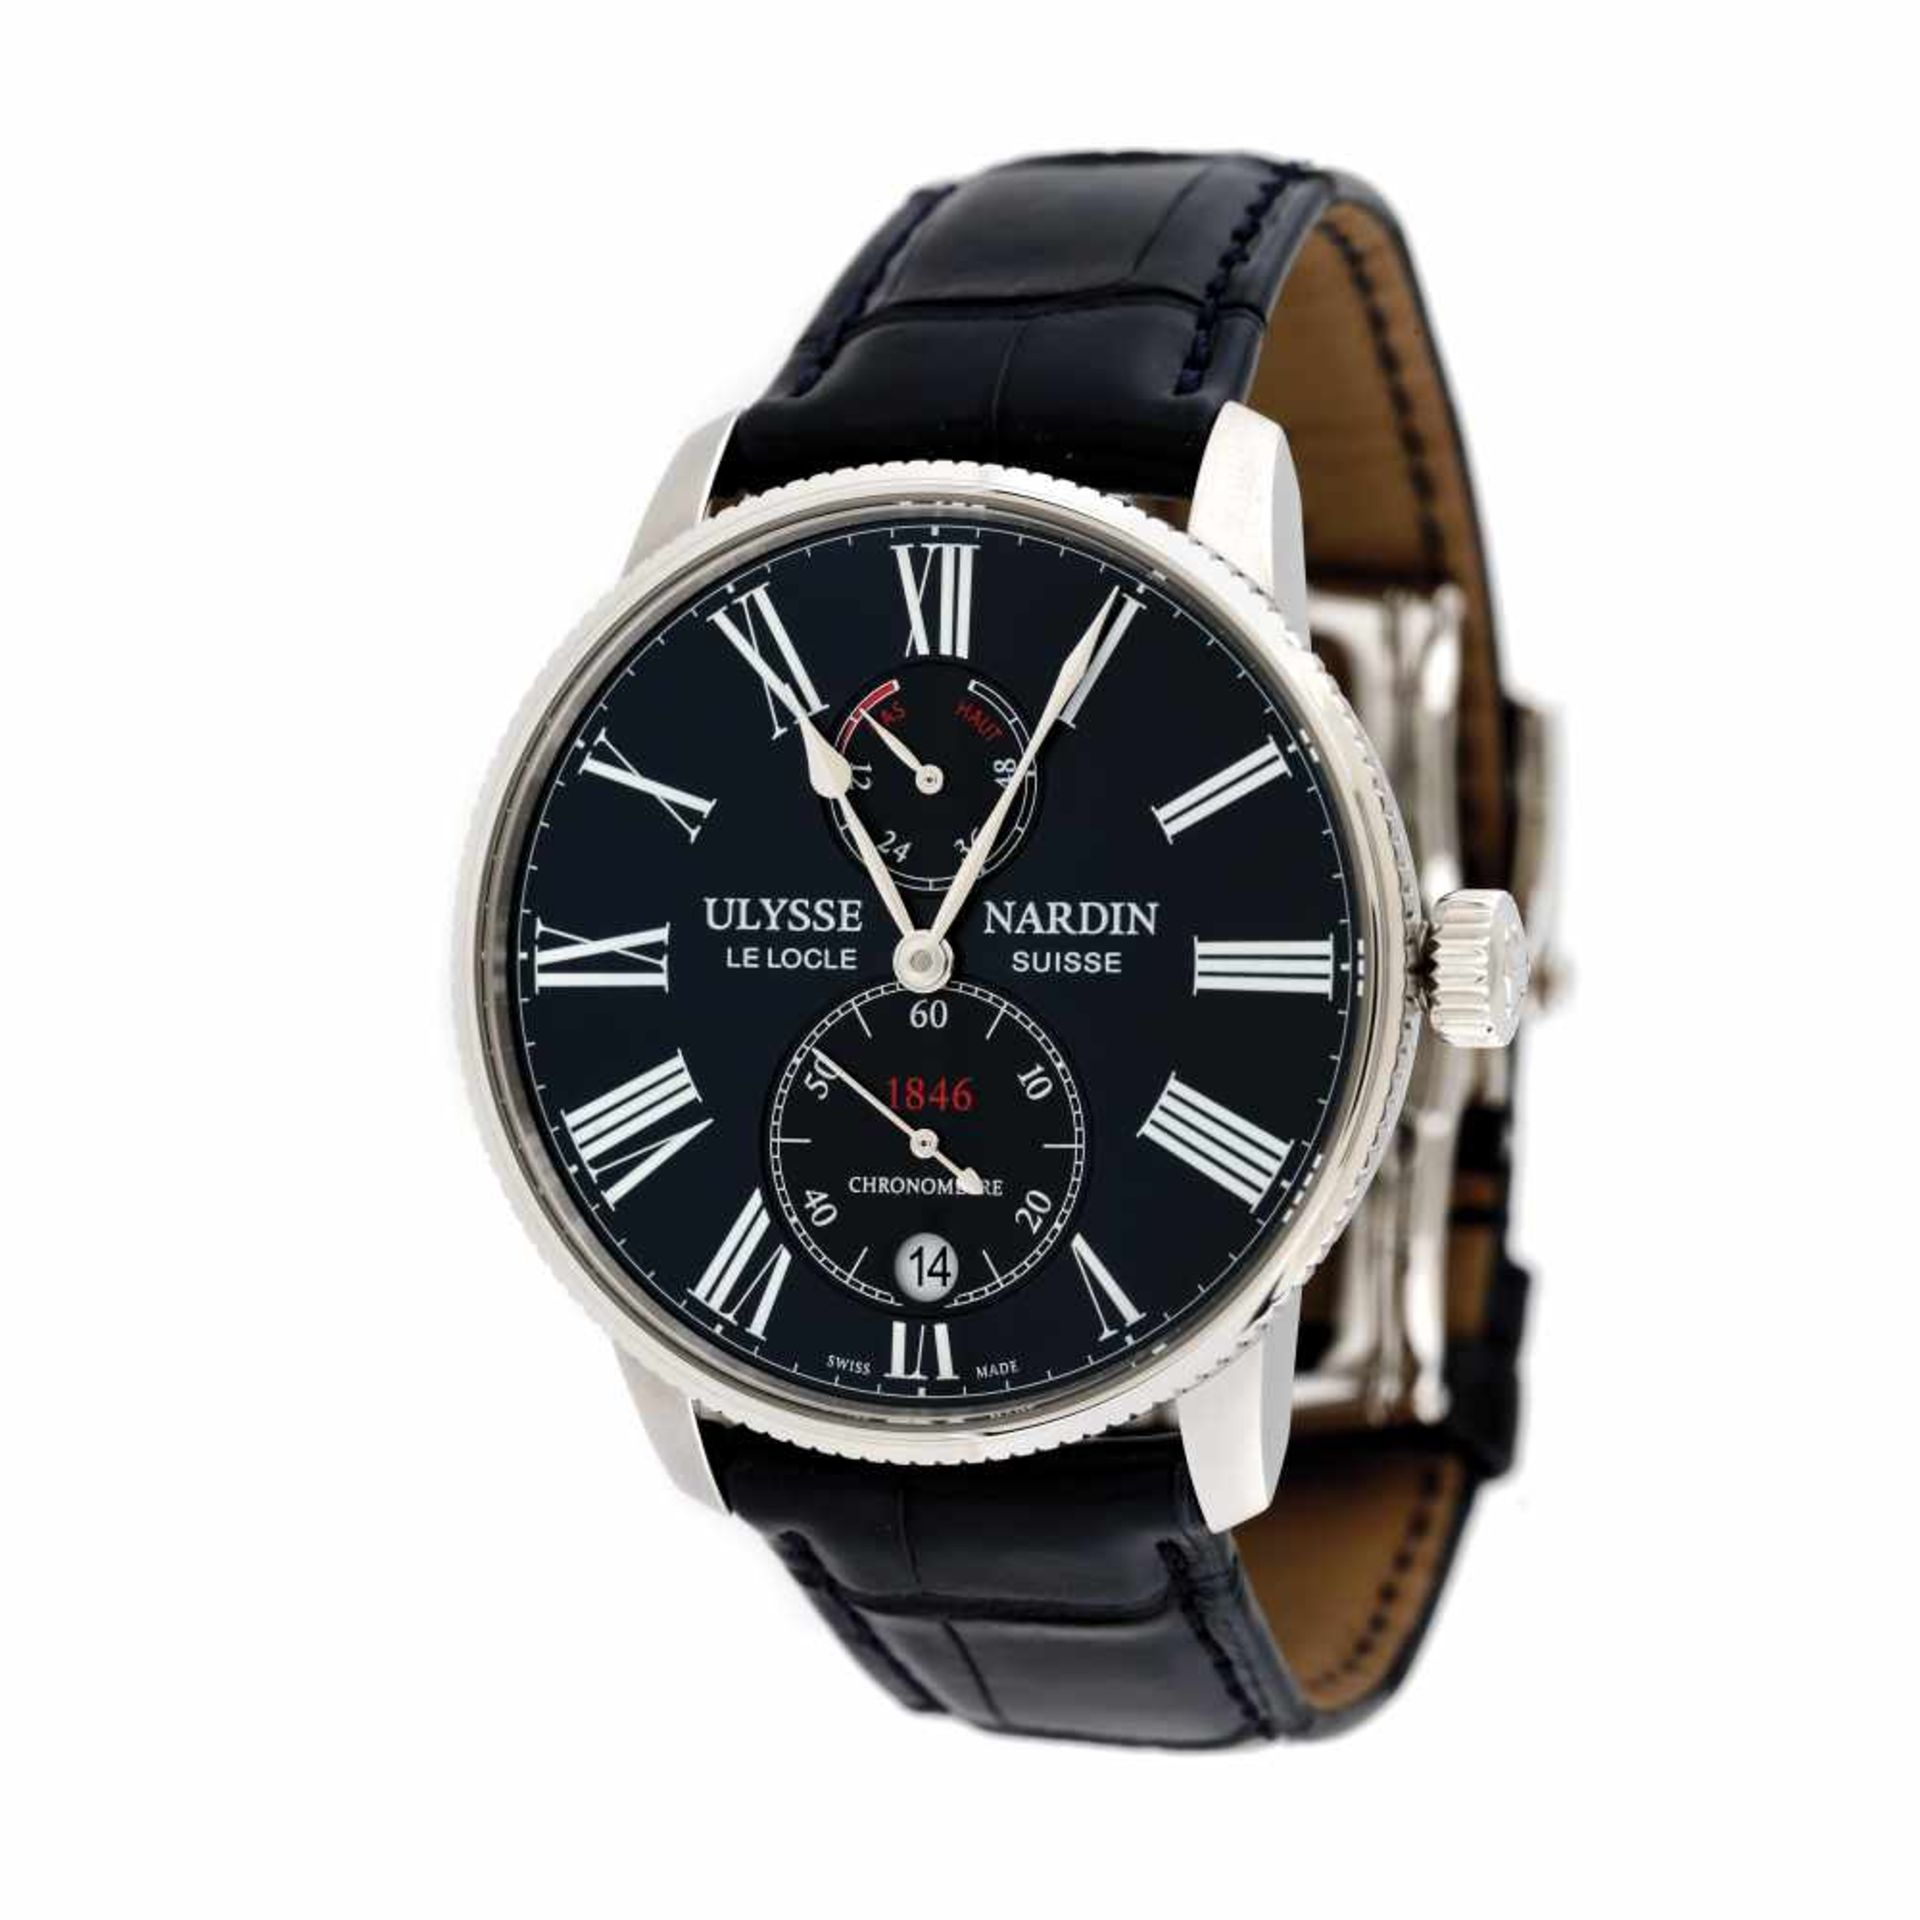 Ulysse Nardin Marine Torpilleur wristwatch, men, original box and authenticity documents